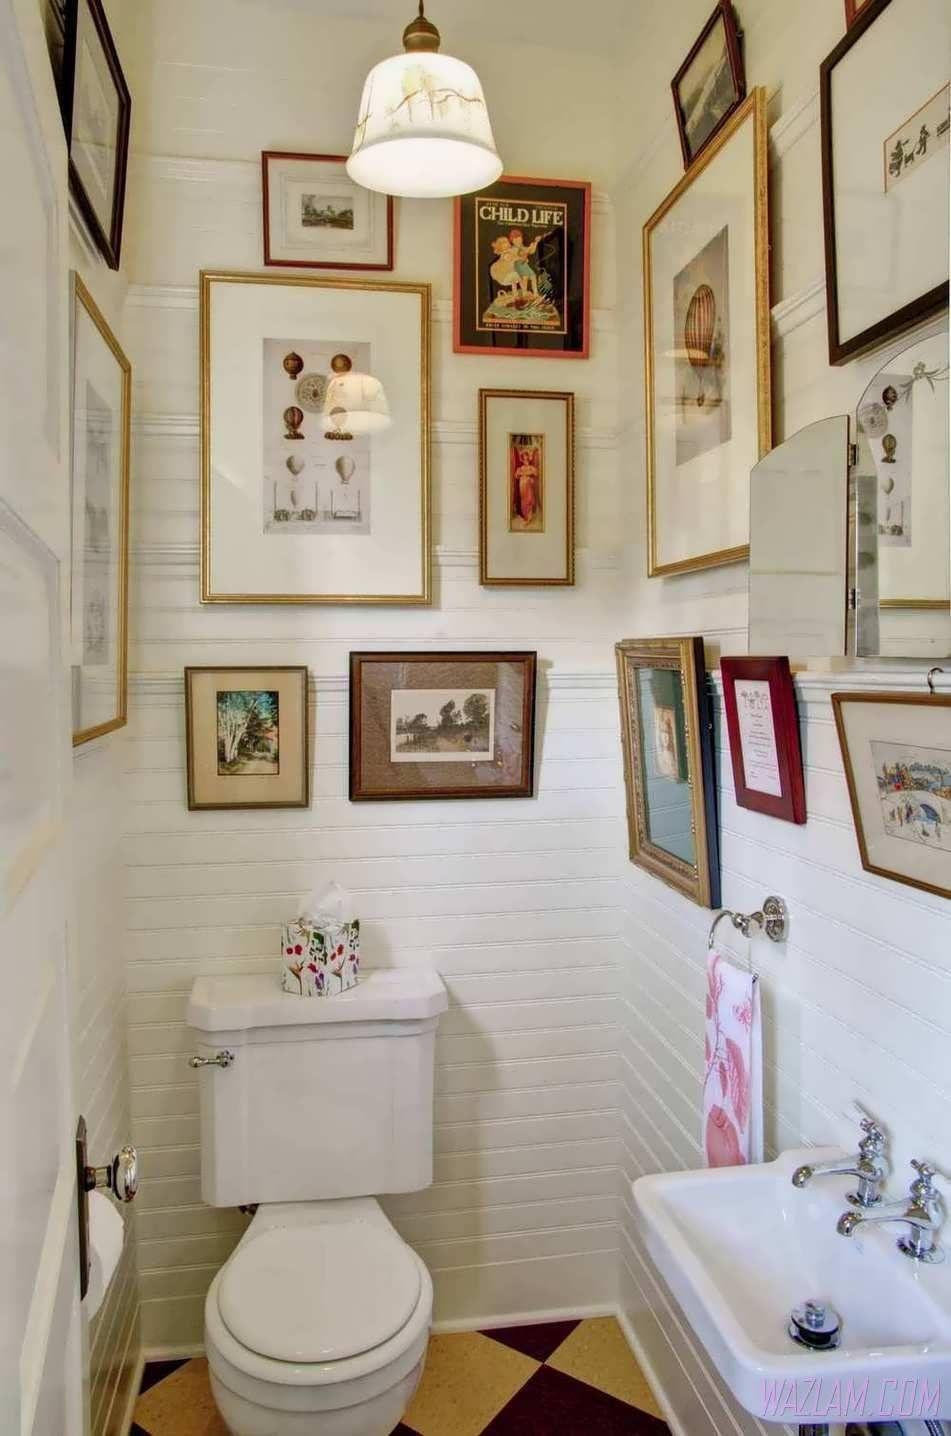 19 Unexpected Bathroom Artwork That Will Take You Aback Homesthetics Inspiring Ideas For Your Home Farmhouse Bathroom Decor Bathroom Wall Decor Tiny Powder Rooms